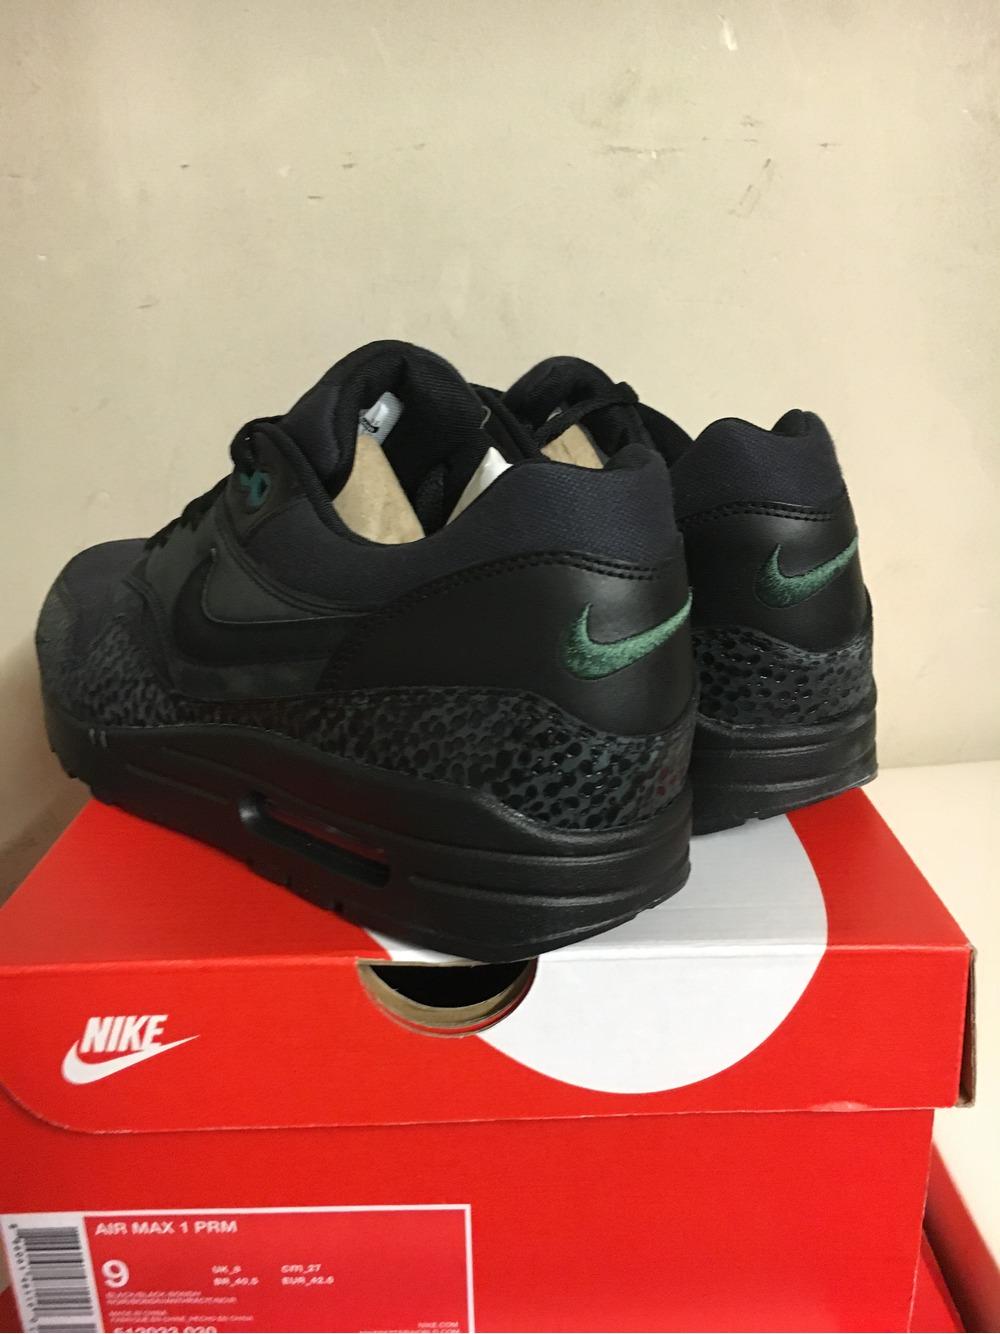 ae90c0edb4d Custom Nike Shox Designed Shoes Swarovski Crystal Designs Made To. cheap  air max 1s size 3